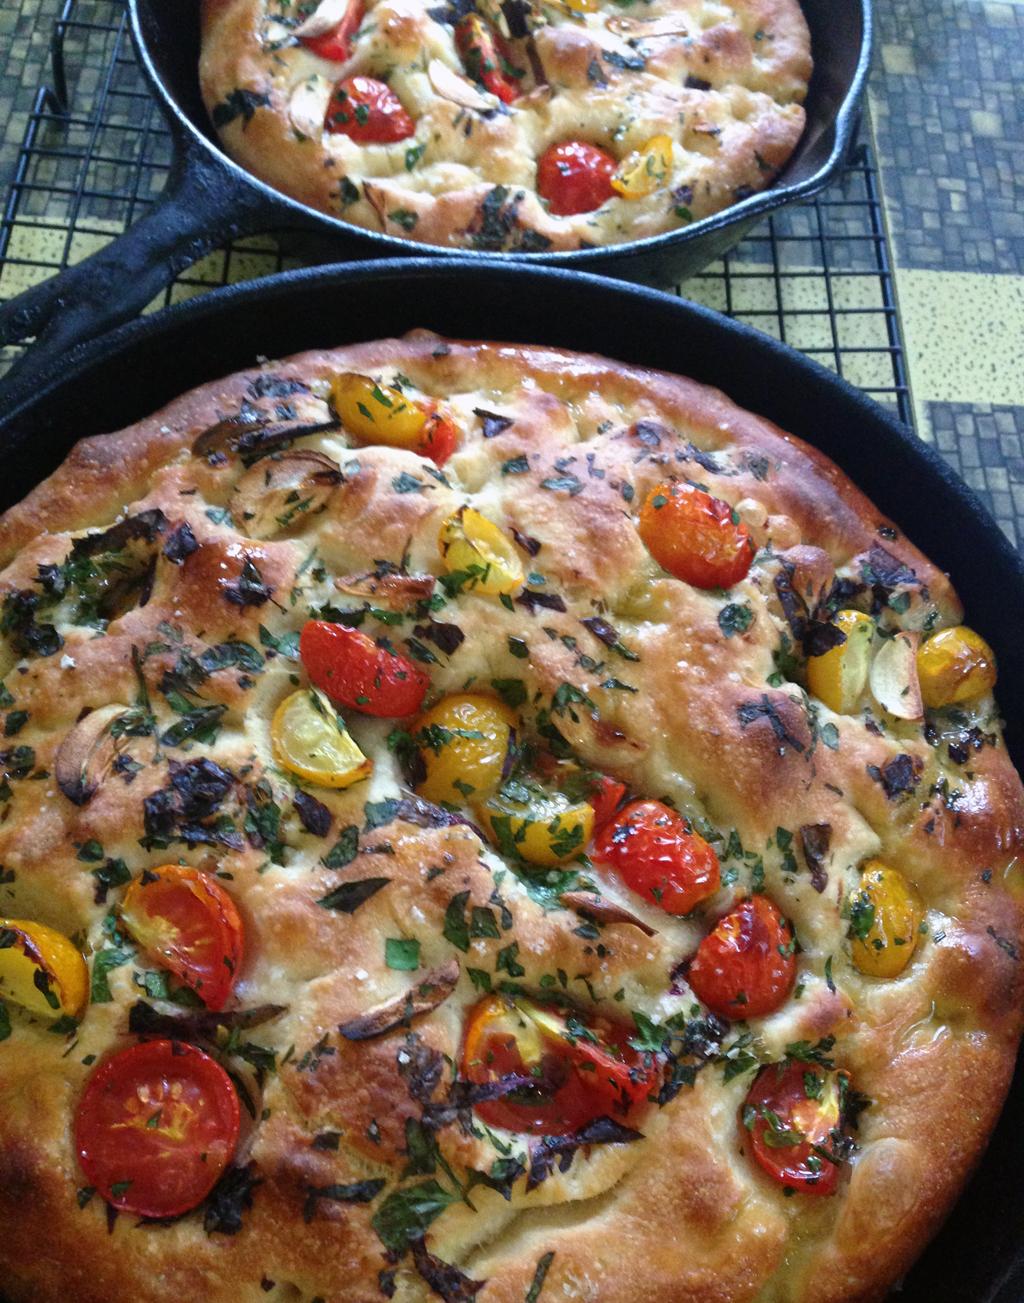 Herb and tomato focaccia.